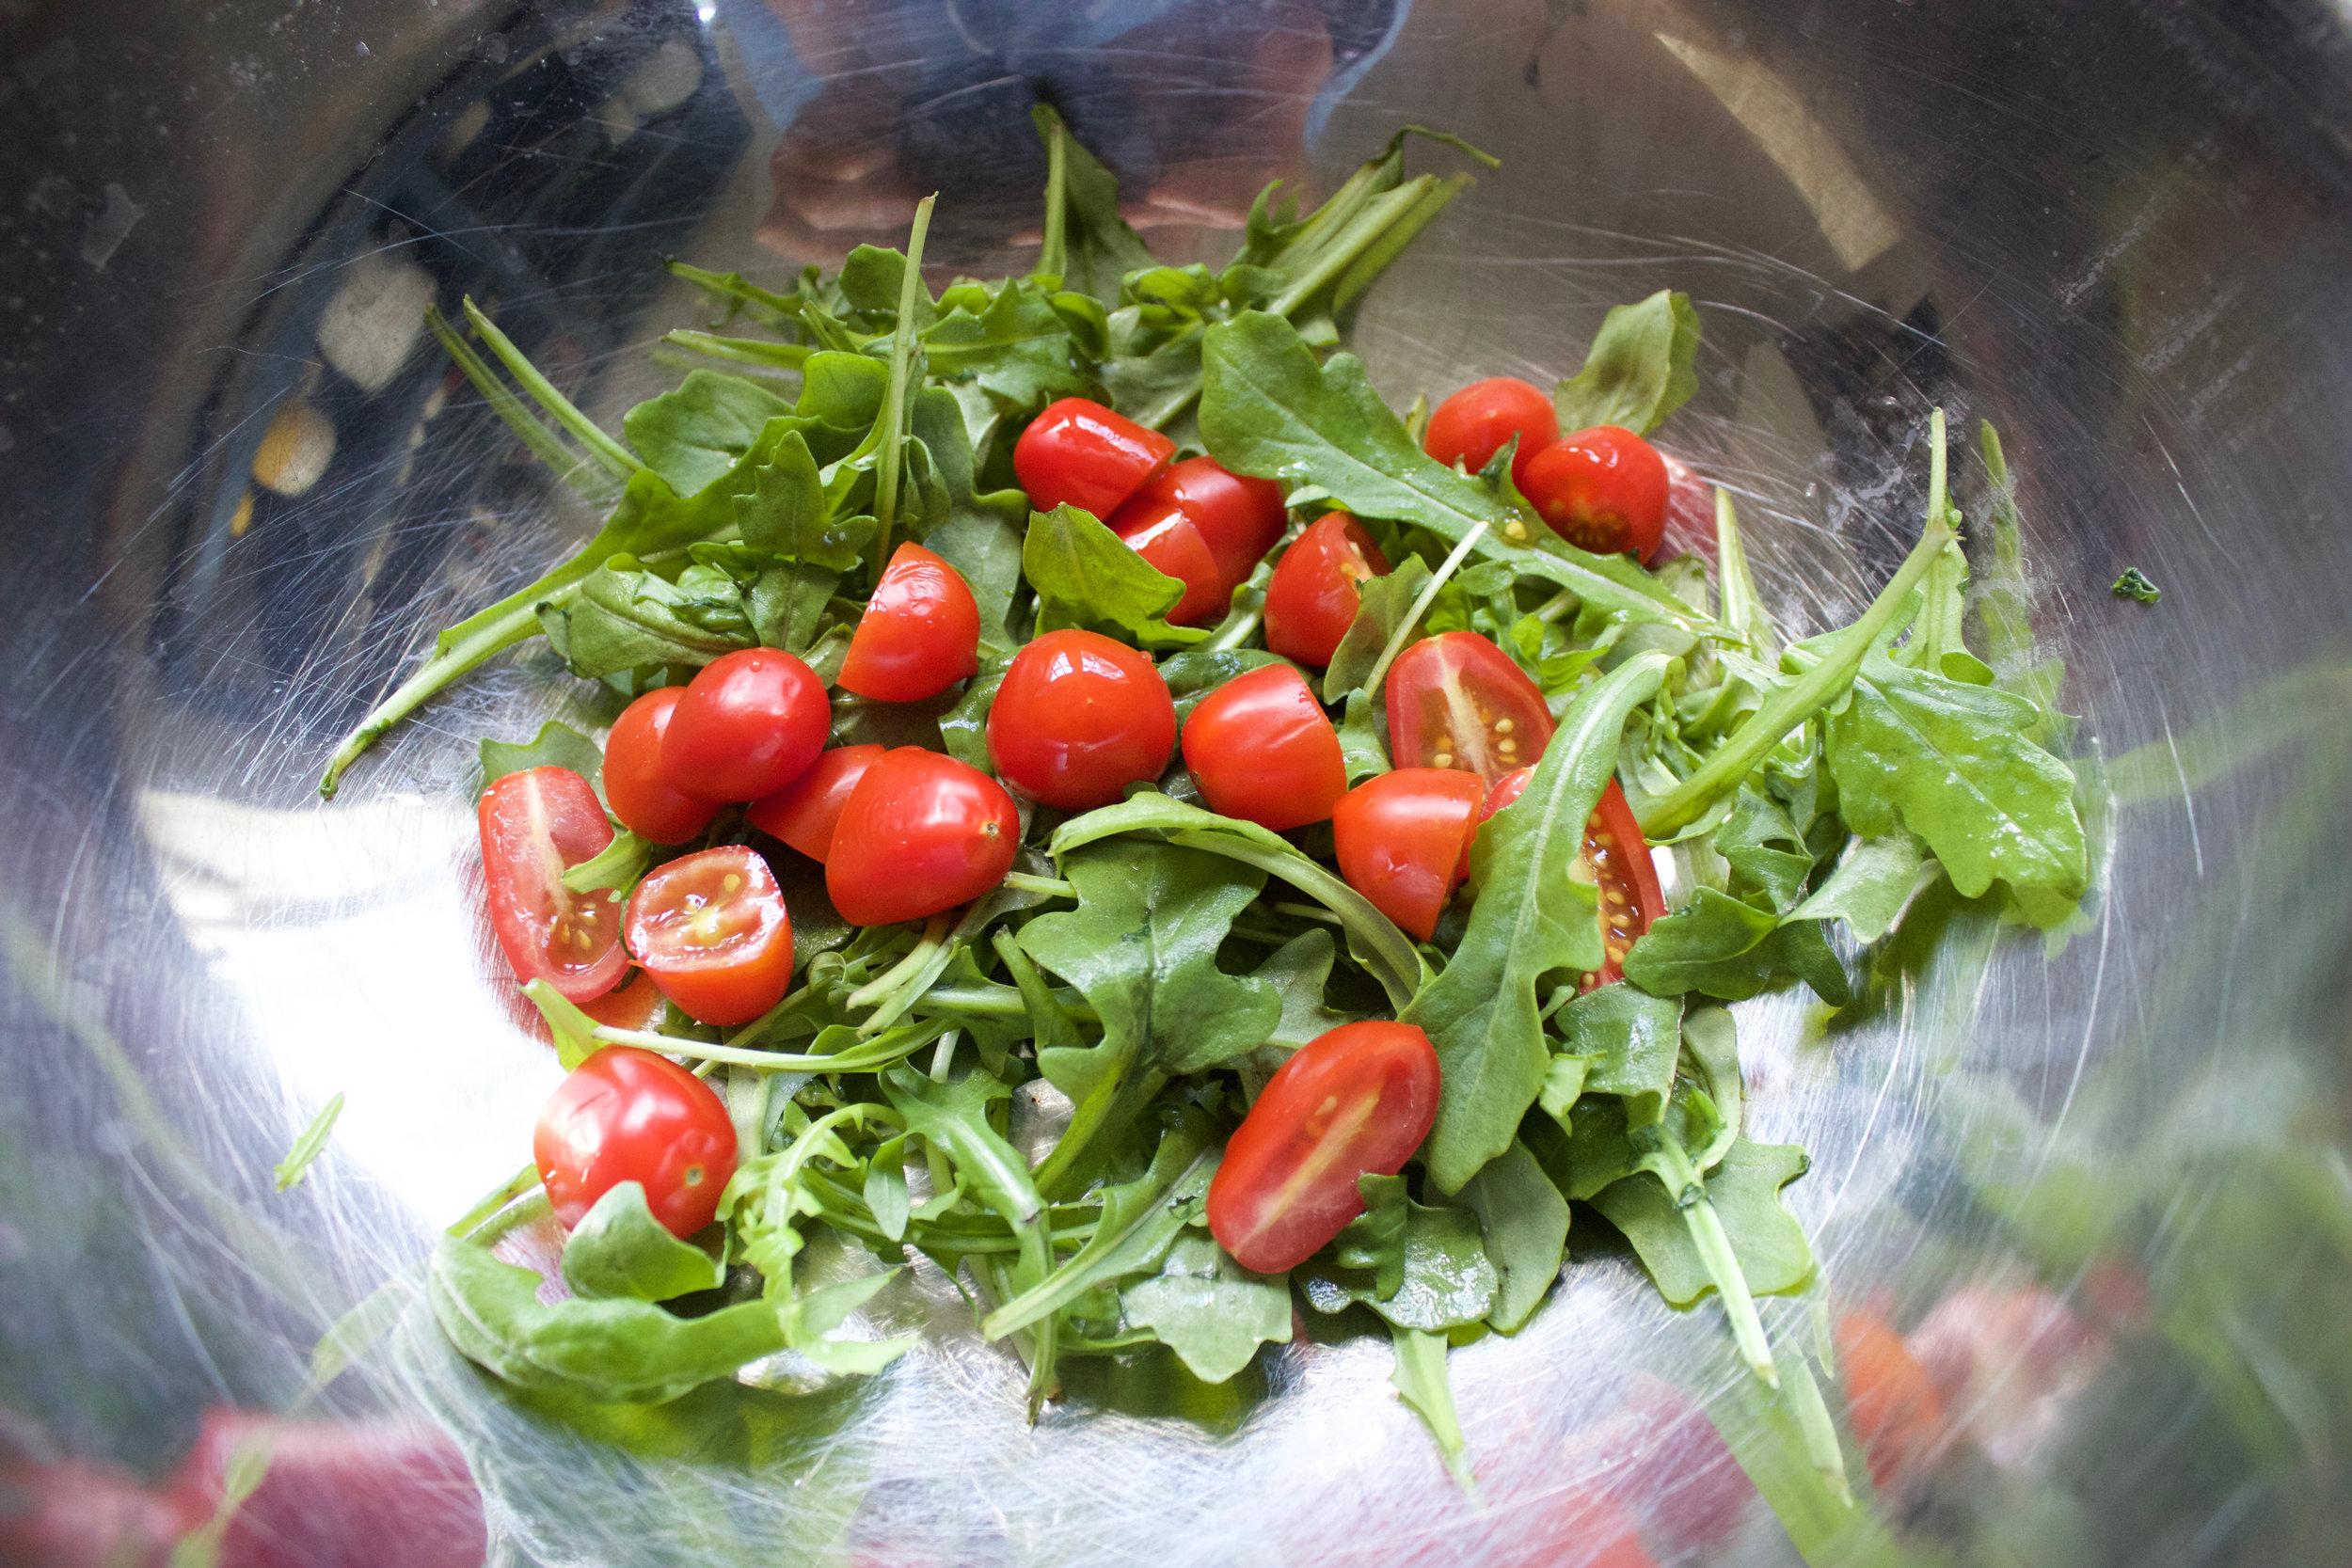 arugula and tomatoes